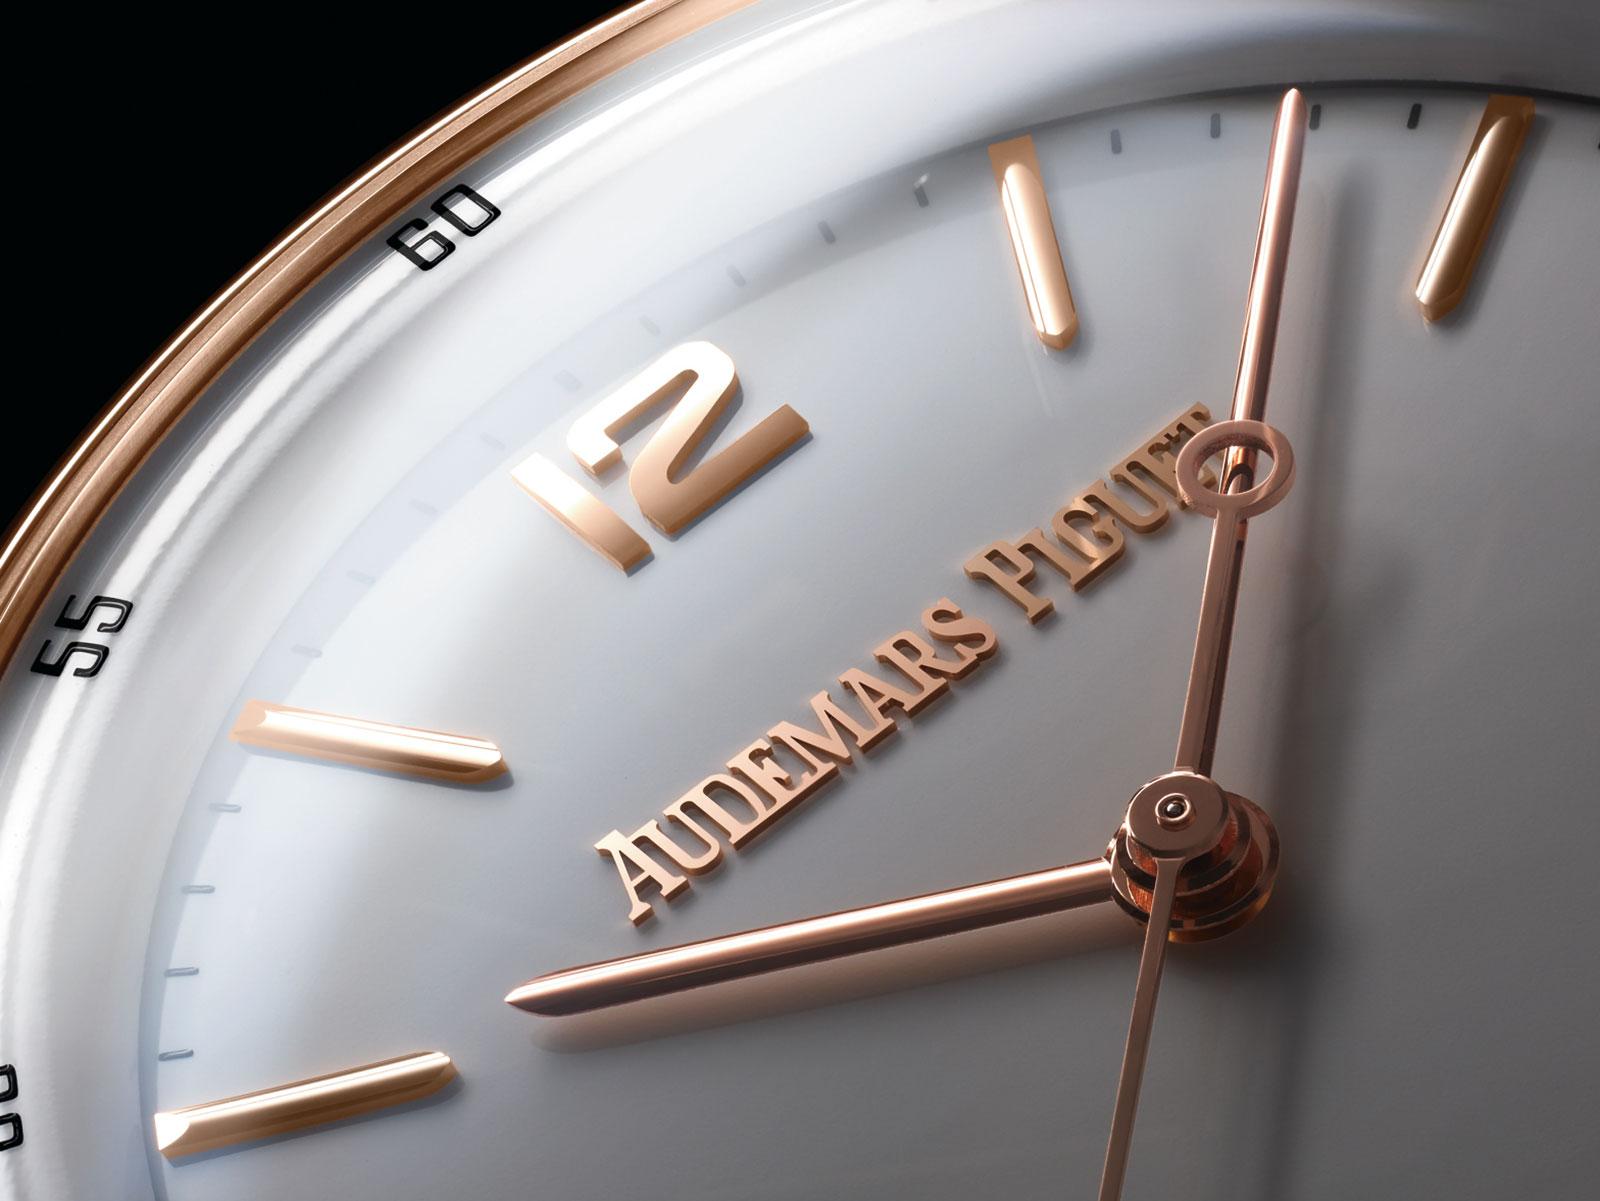 Audemars Piguet Code 1159 automatic 2